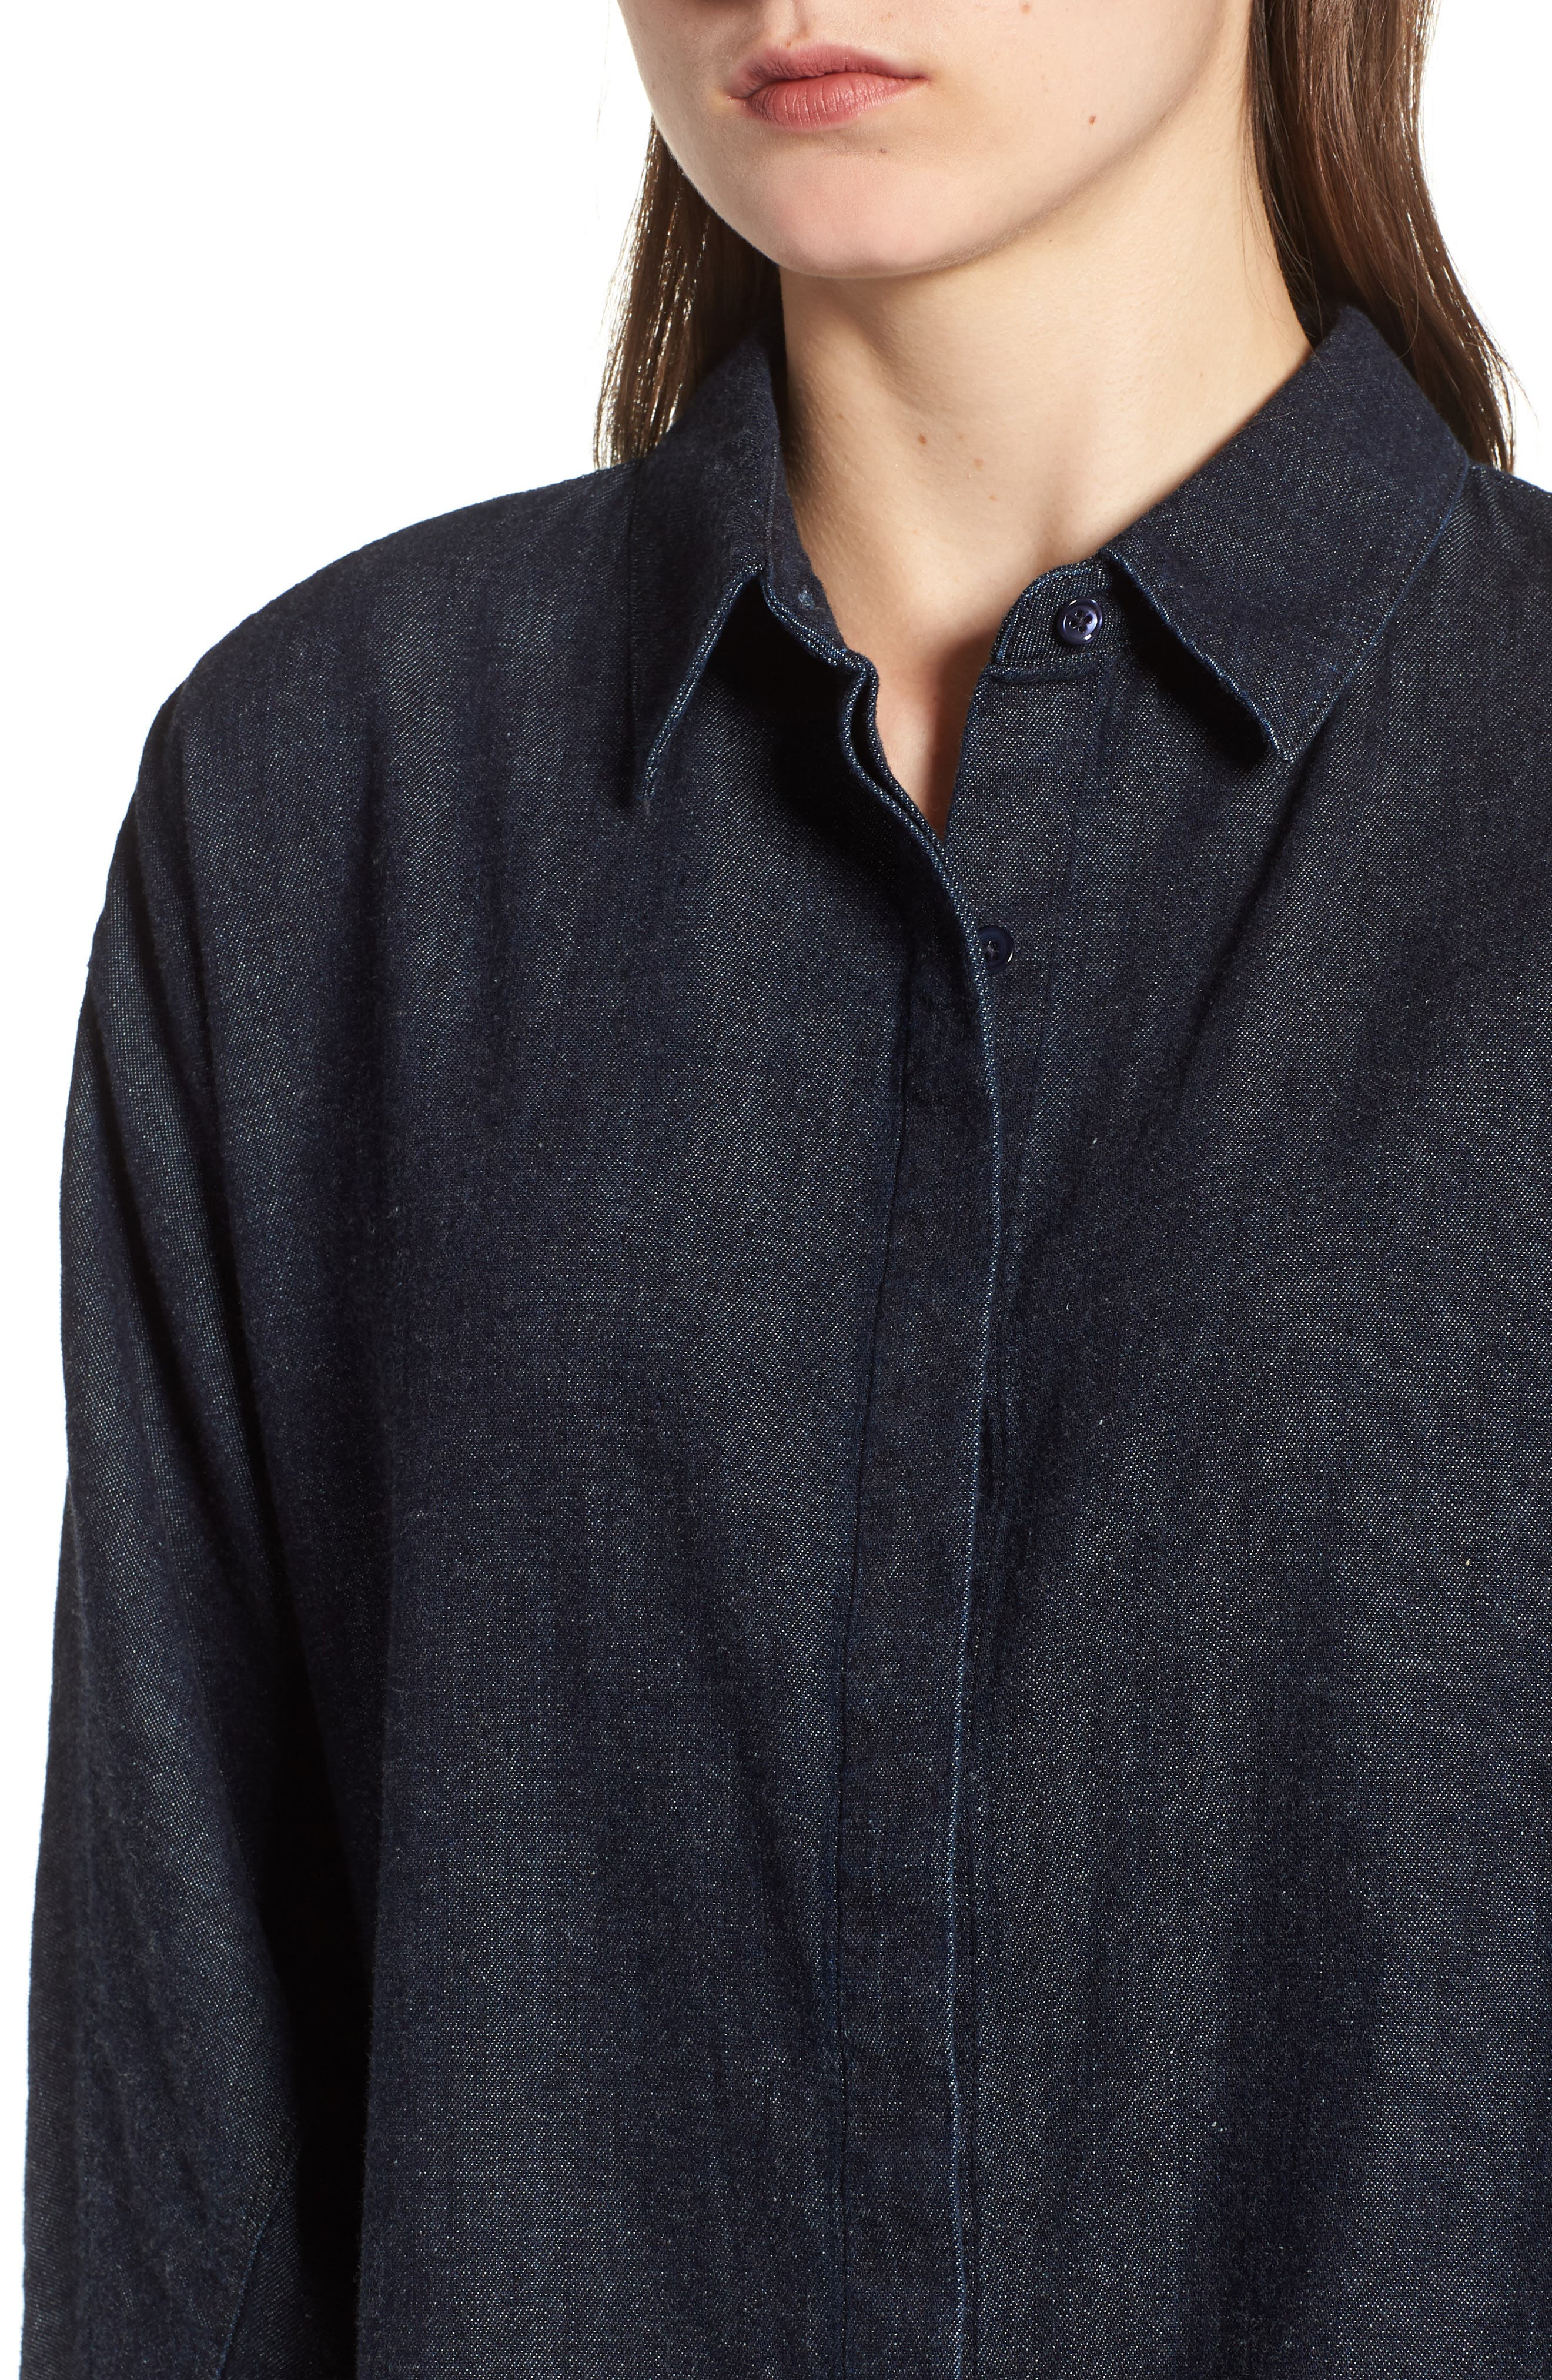 Acoustic Denim Shirt,                             Alternate thumbnail 4, color,                             439